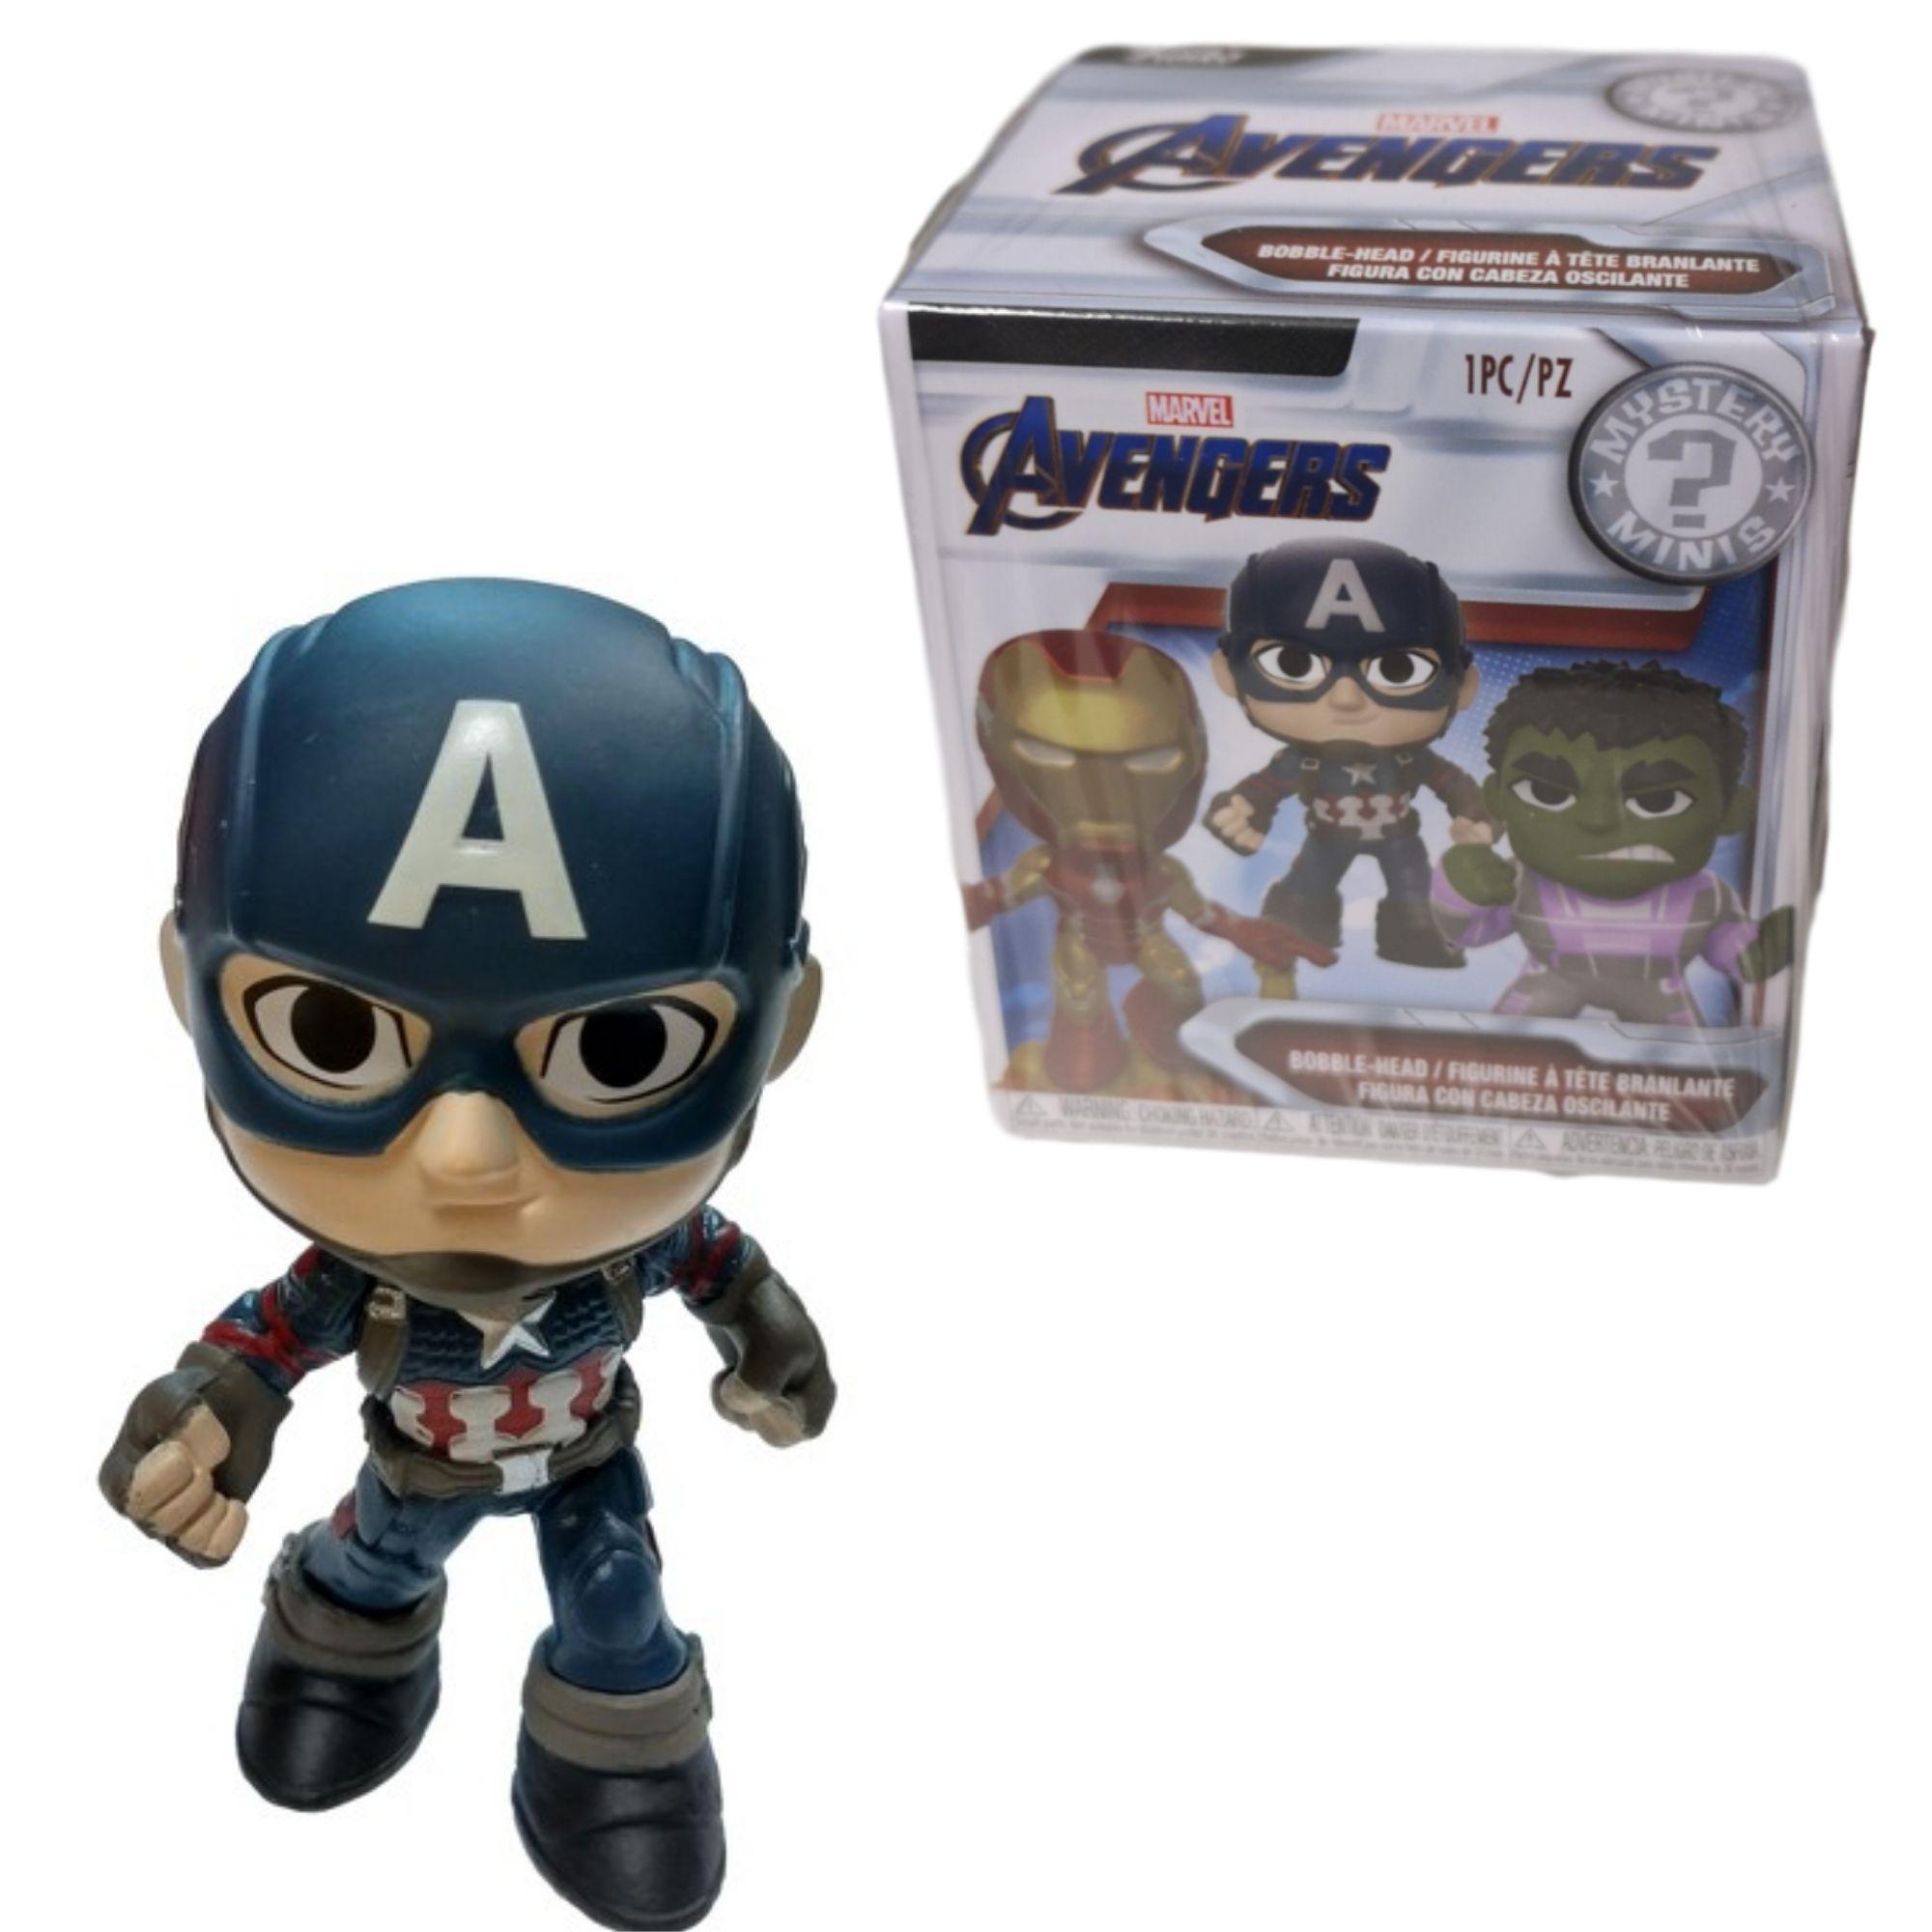 Funko Mini Mystery Marvel Avengers Capitão America Bobble-Head   - Game Land Brinquedos